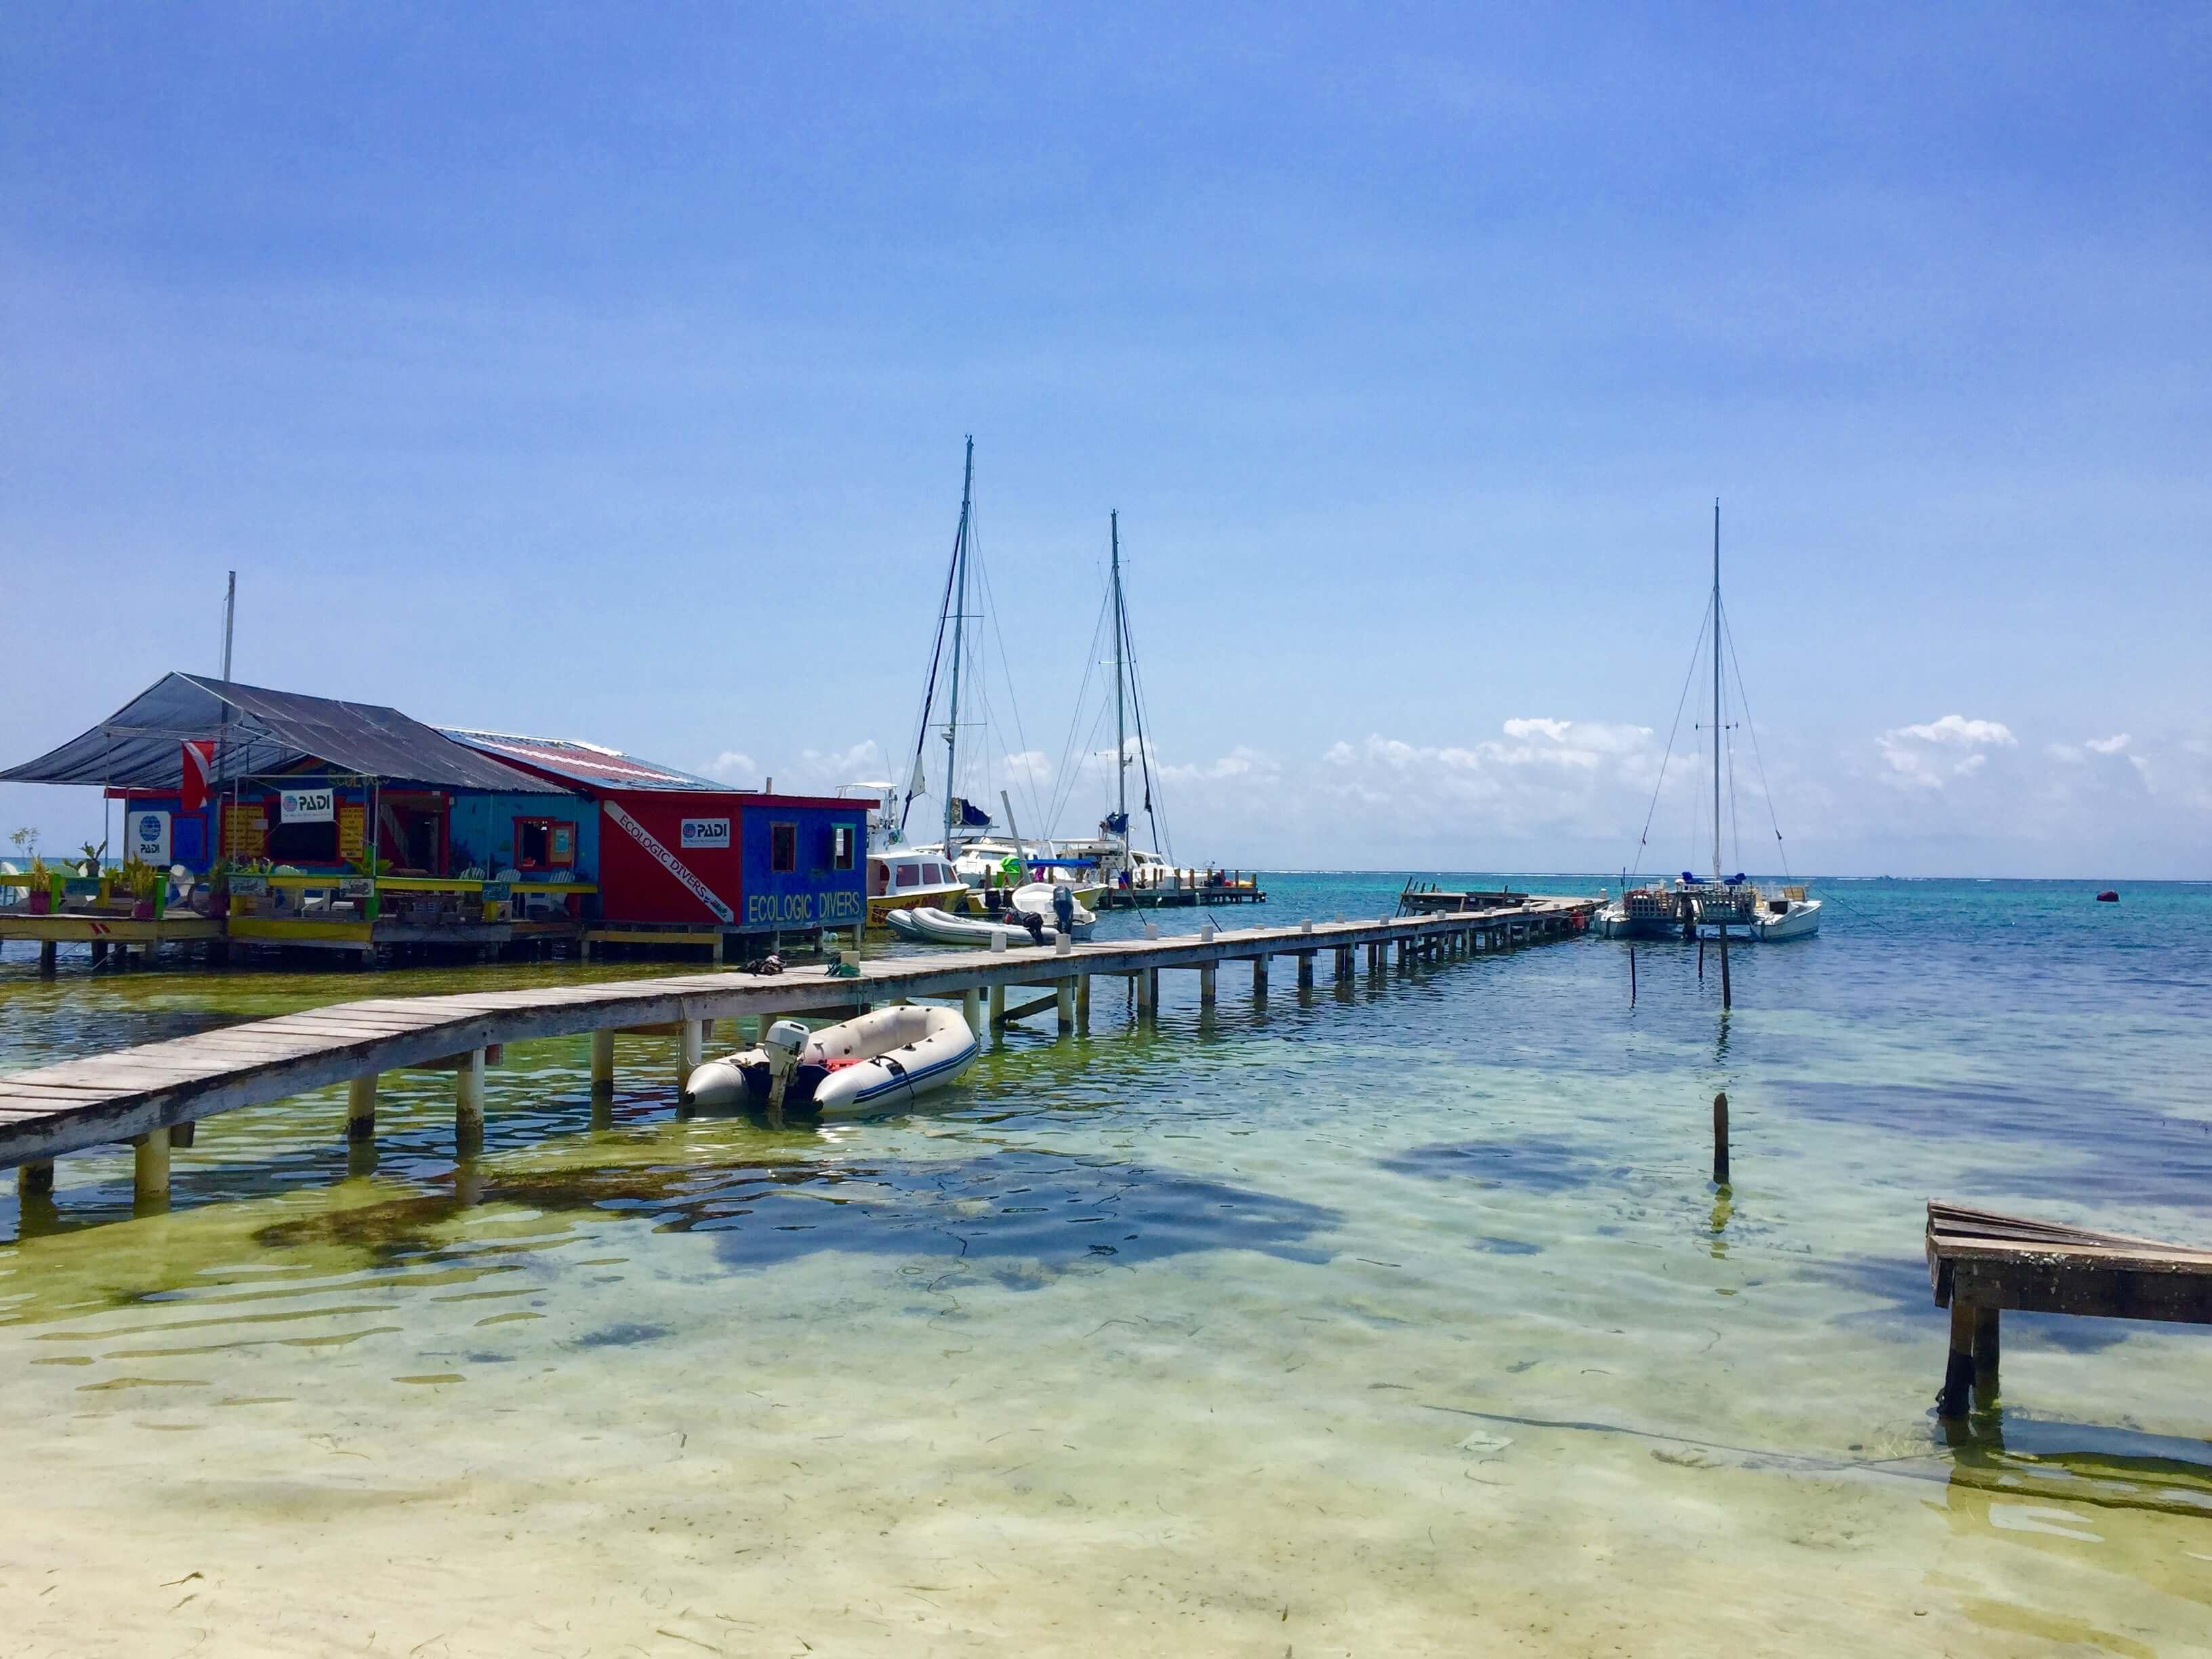 blog-you-better-belize-it-caye-caulker-dock-ocean